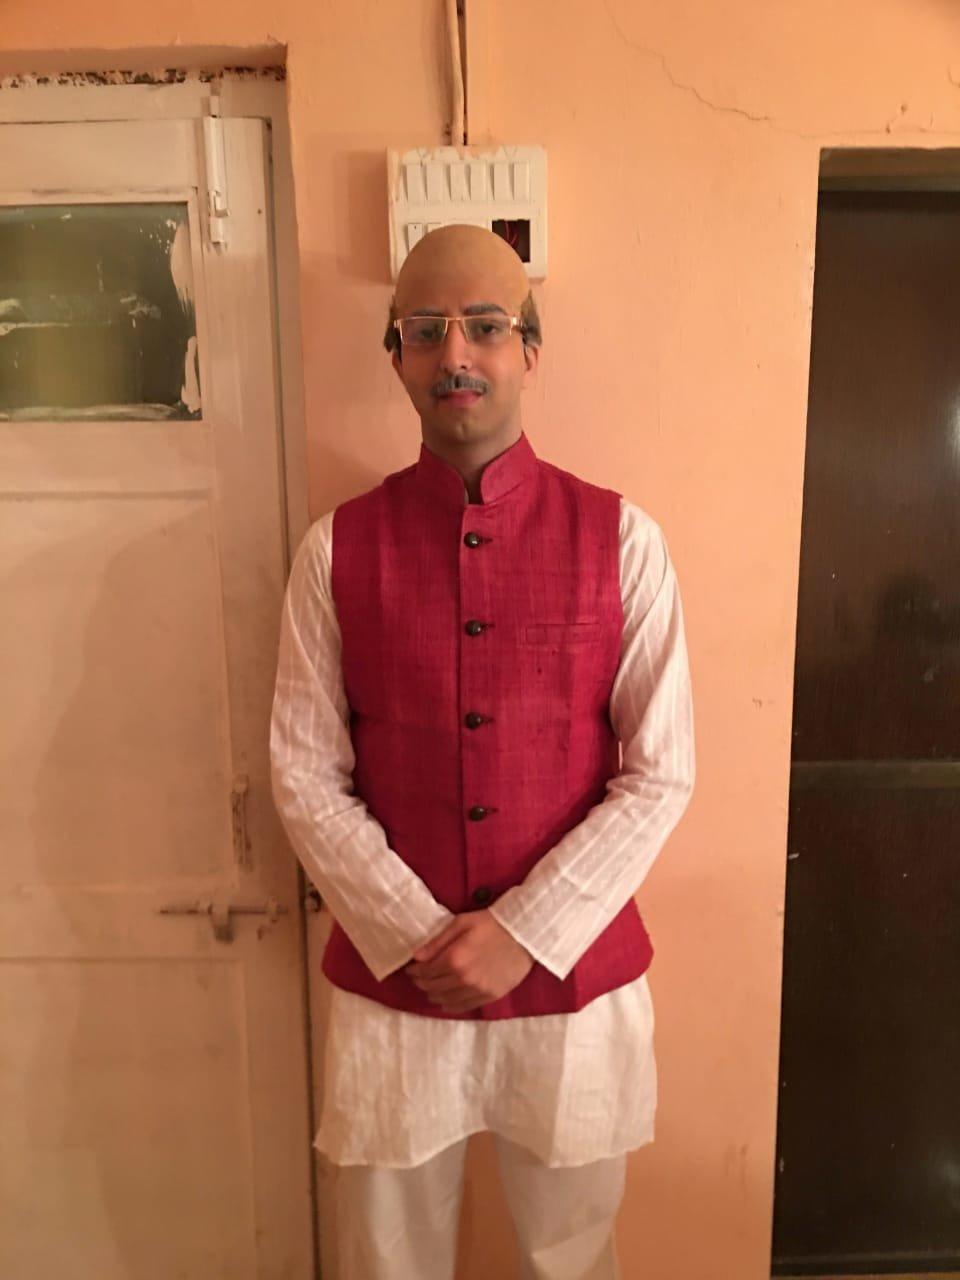 Shreyas Porus Pardiwalla to play L K Advani in a parody film on YouTube